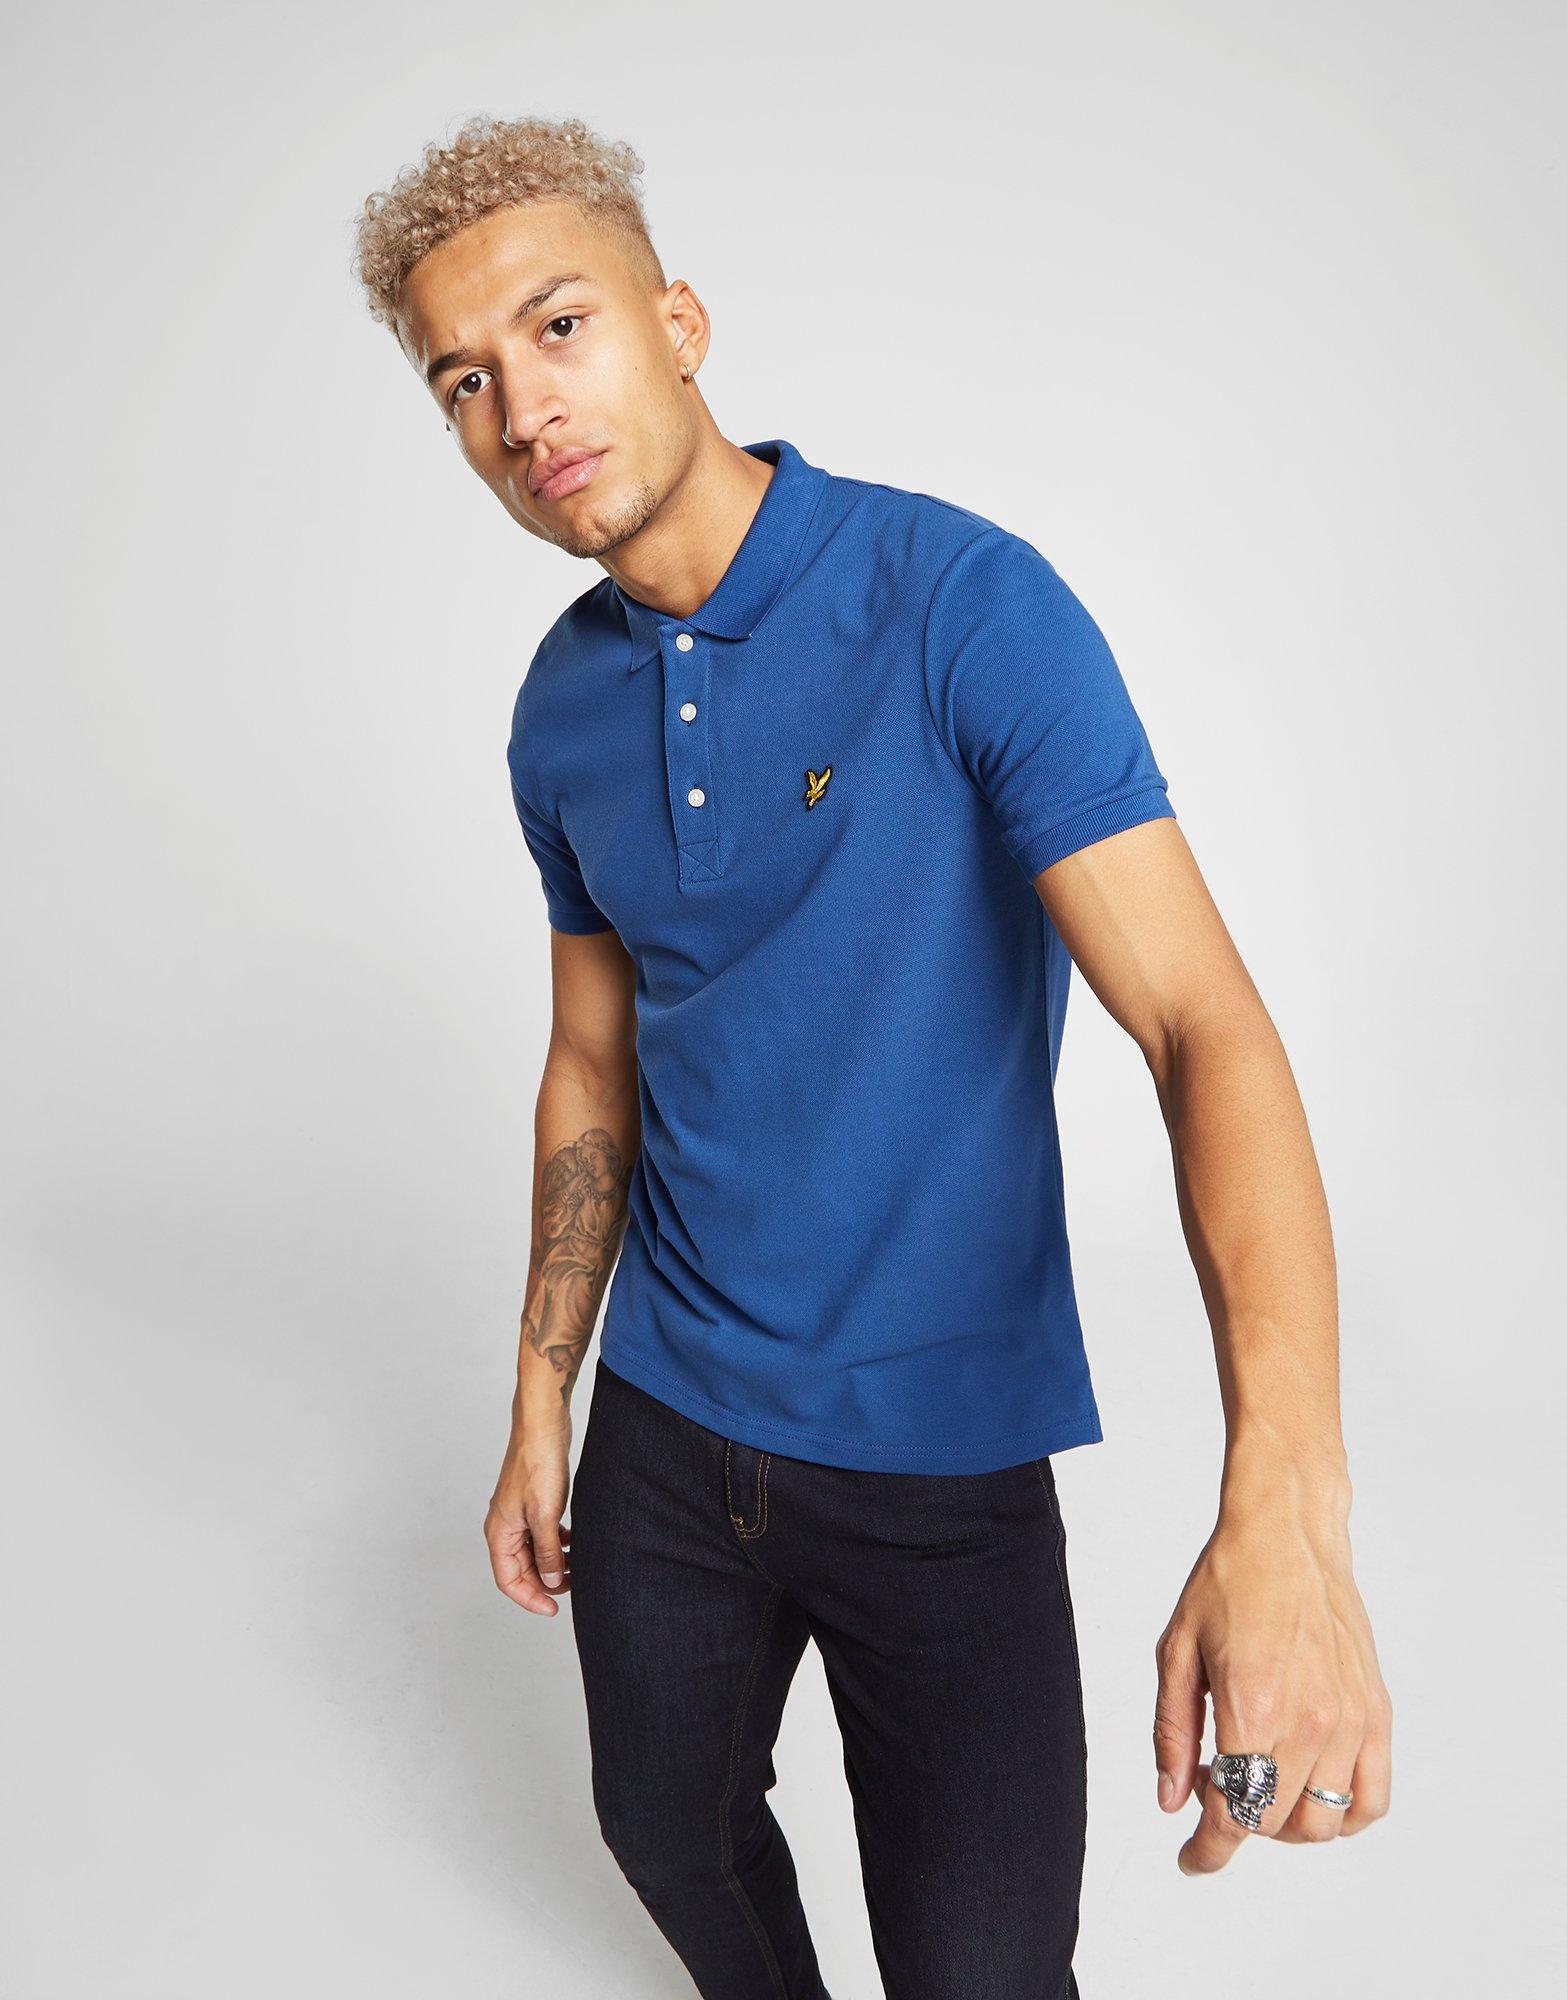 fad01d22546 Lyle   Scott Core Polo Shirt in Blue for Men - Lyst